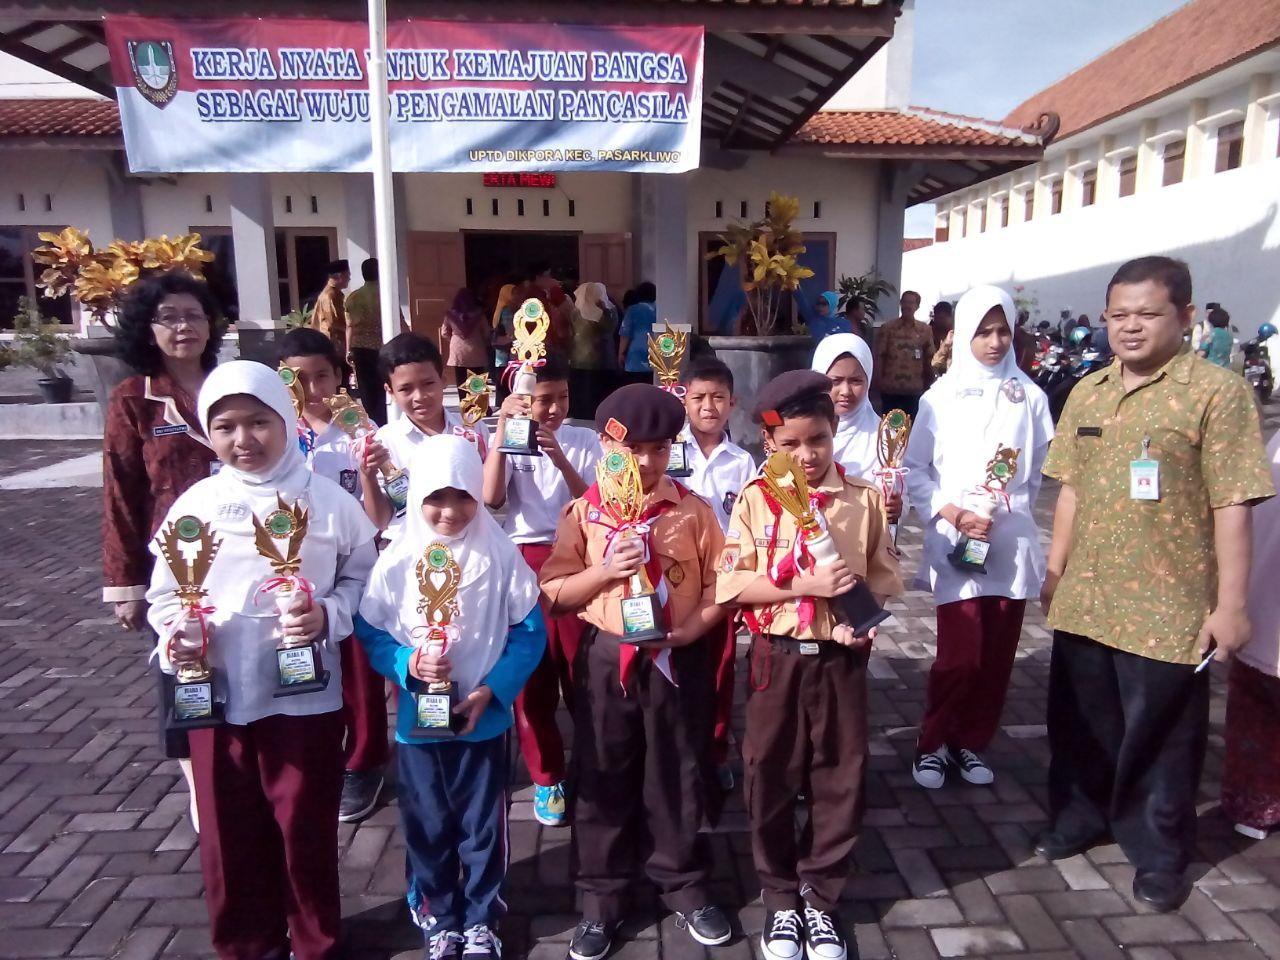 Alhamdulillah, SD Islam Diponegoro Surakarta Sukses Borong Juara